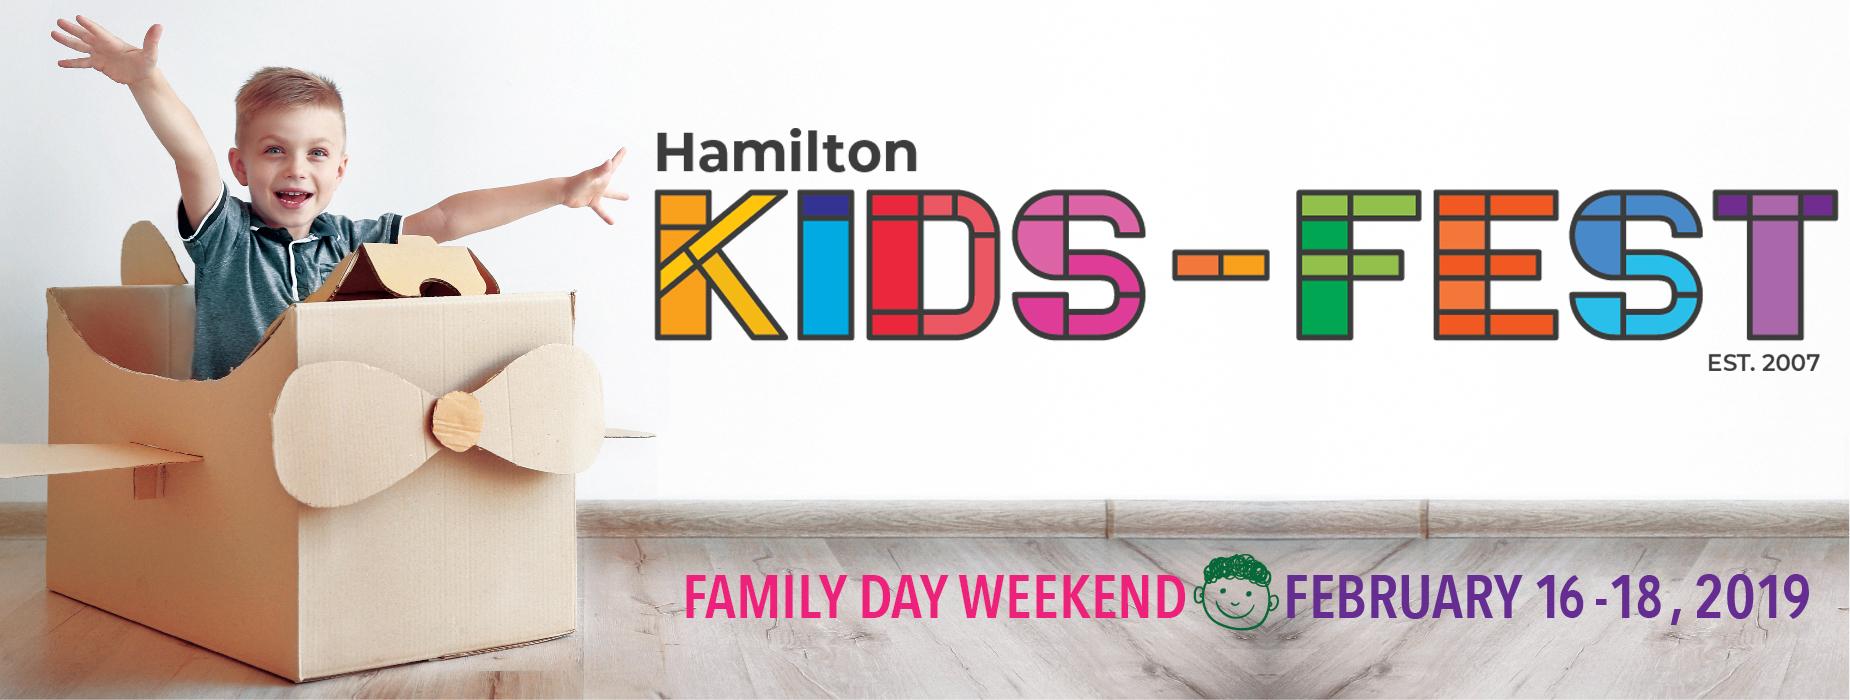 Banner Image for the Hamilton Kids-Fest event